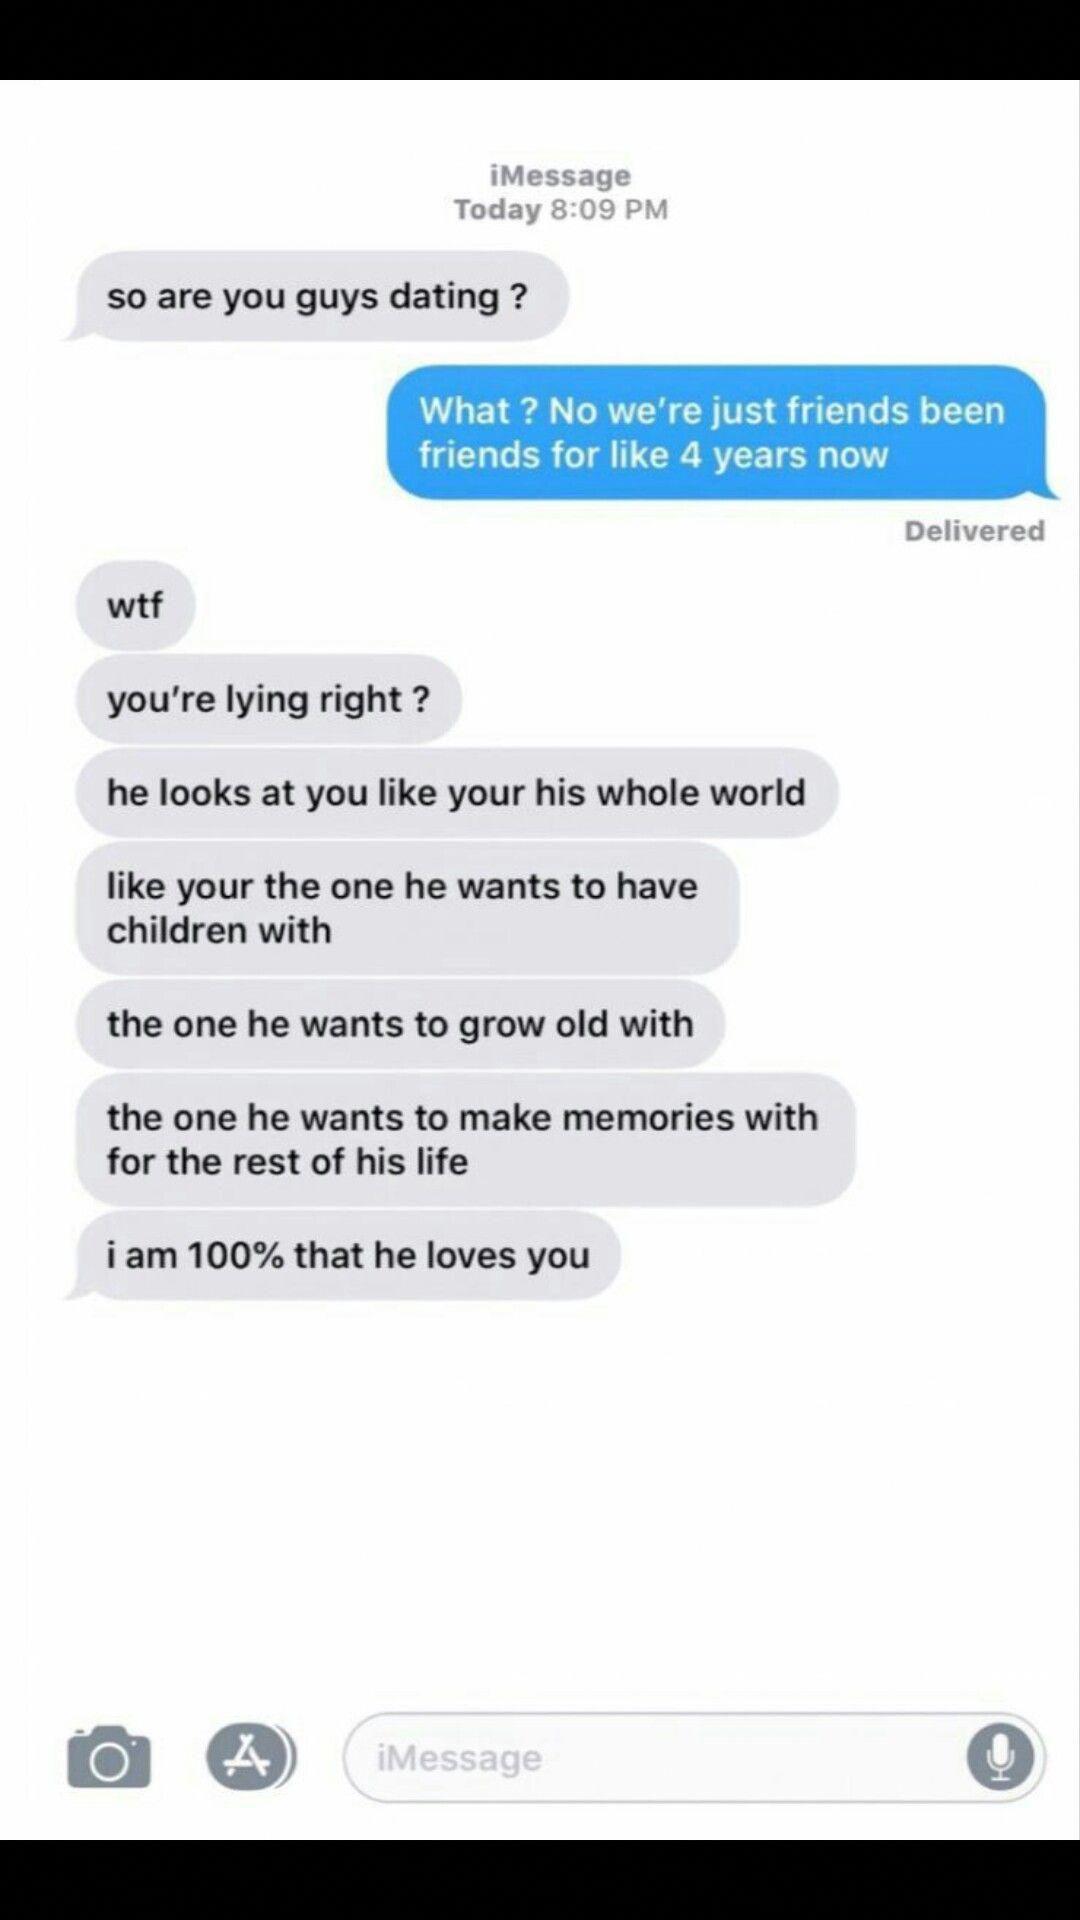 Jadastockerr Relationshipgoalscute Cute Relationship Goals Relationship Goals Text Cute Relationship Texts